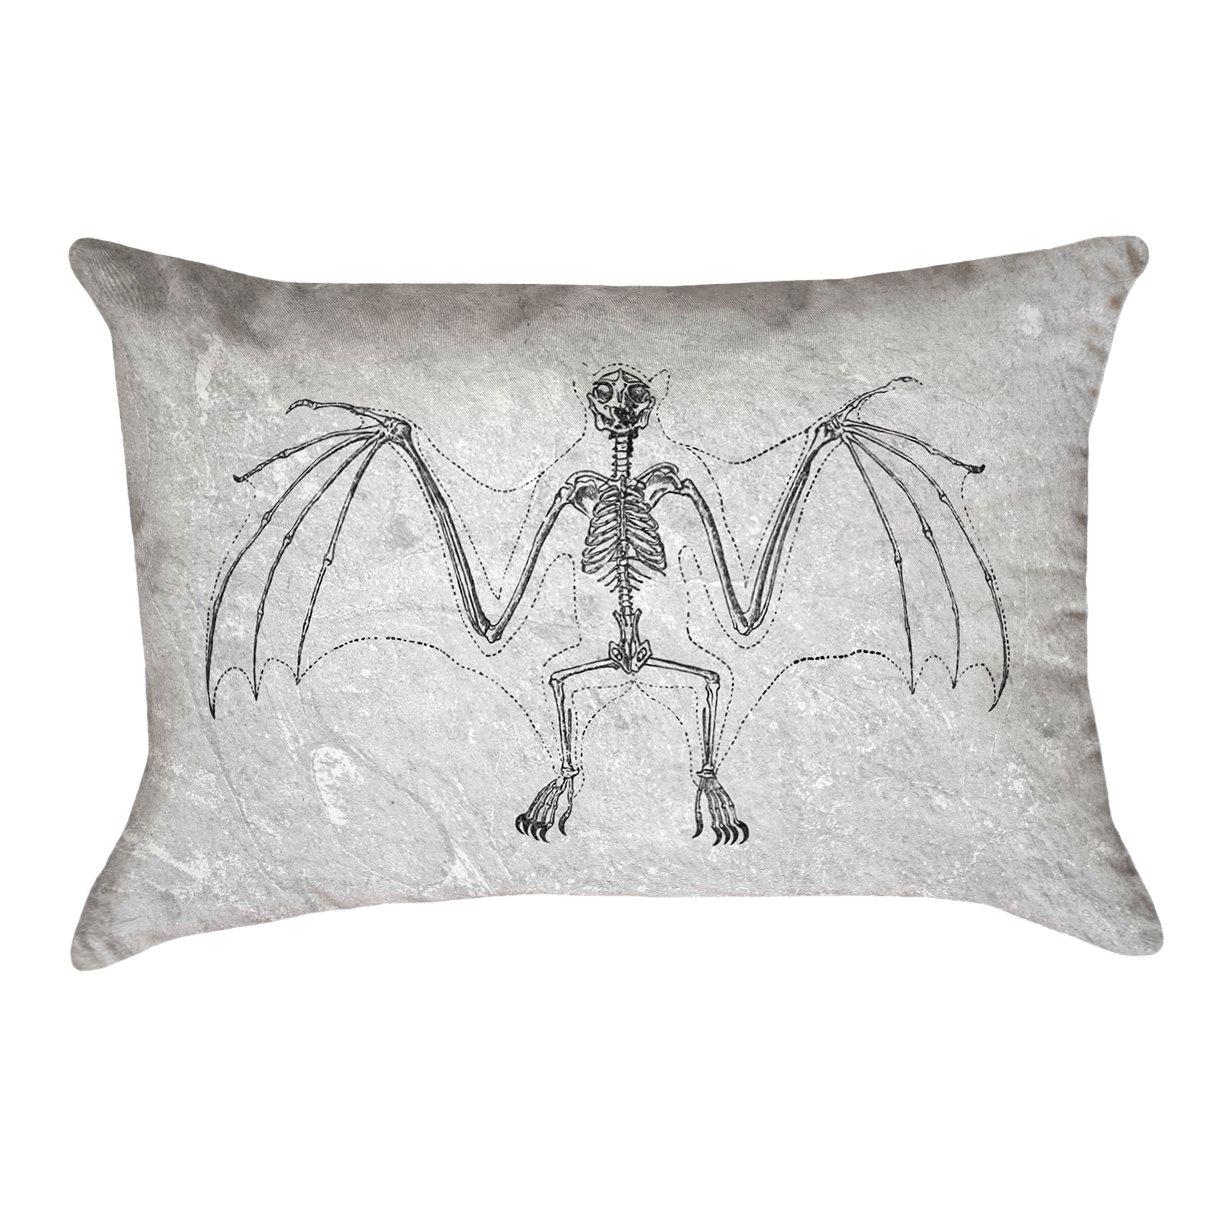 ArtVerse Katelyn Smith 20 x 20 Outdoor Pillows /& Cushions UV Properties Waterproof and Mildew Proof Vintage Bat Skeleton Pillow